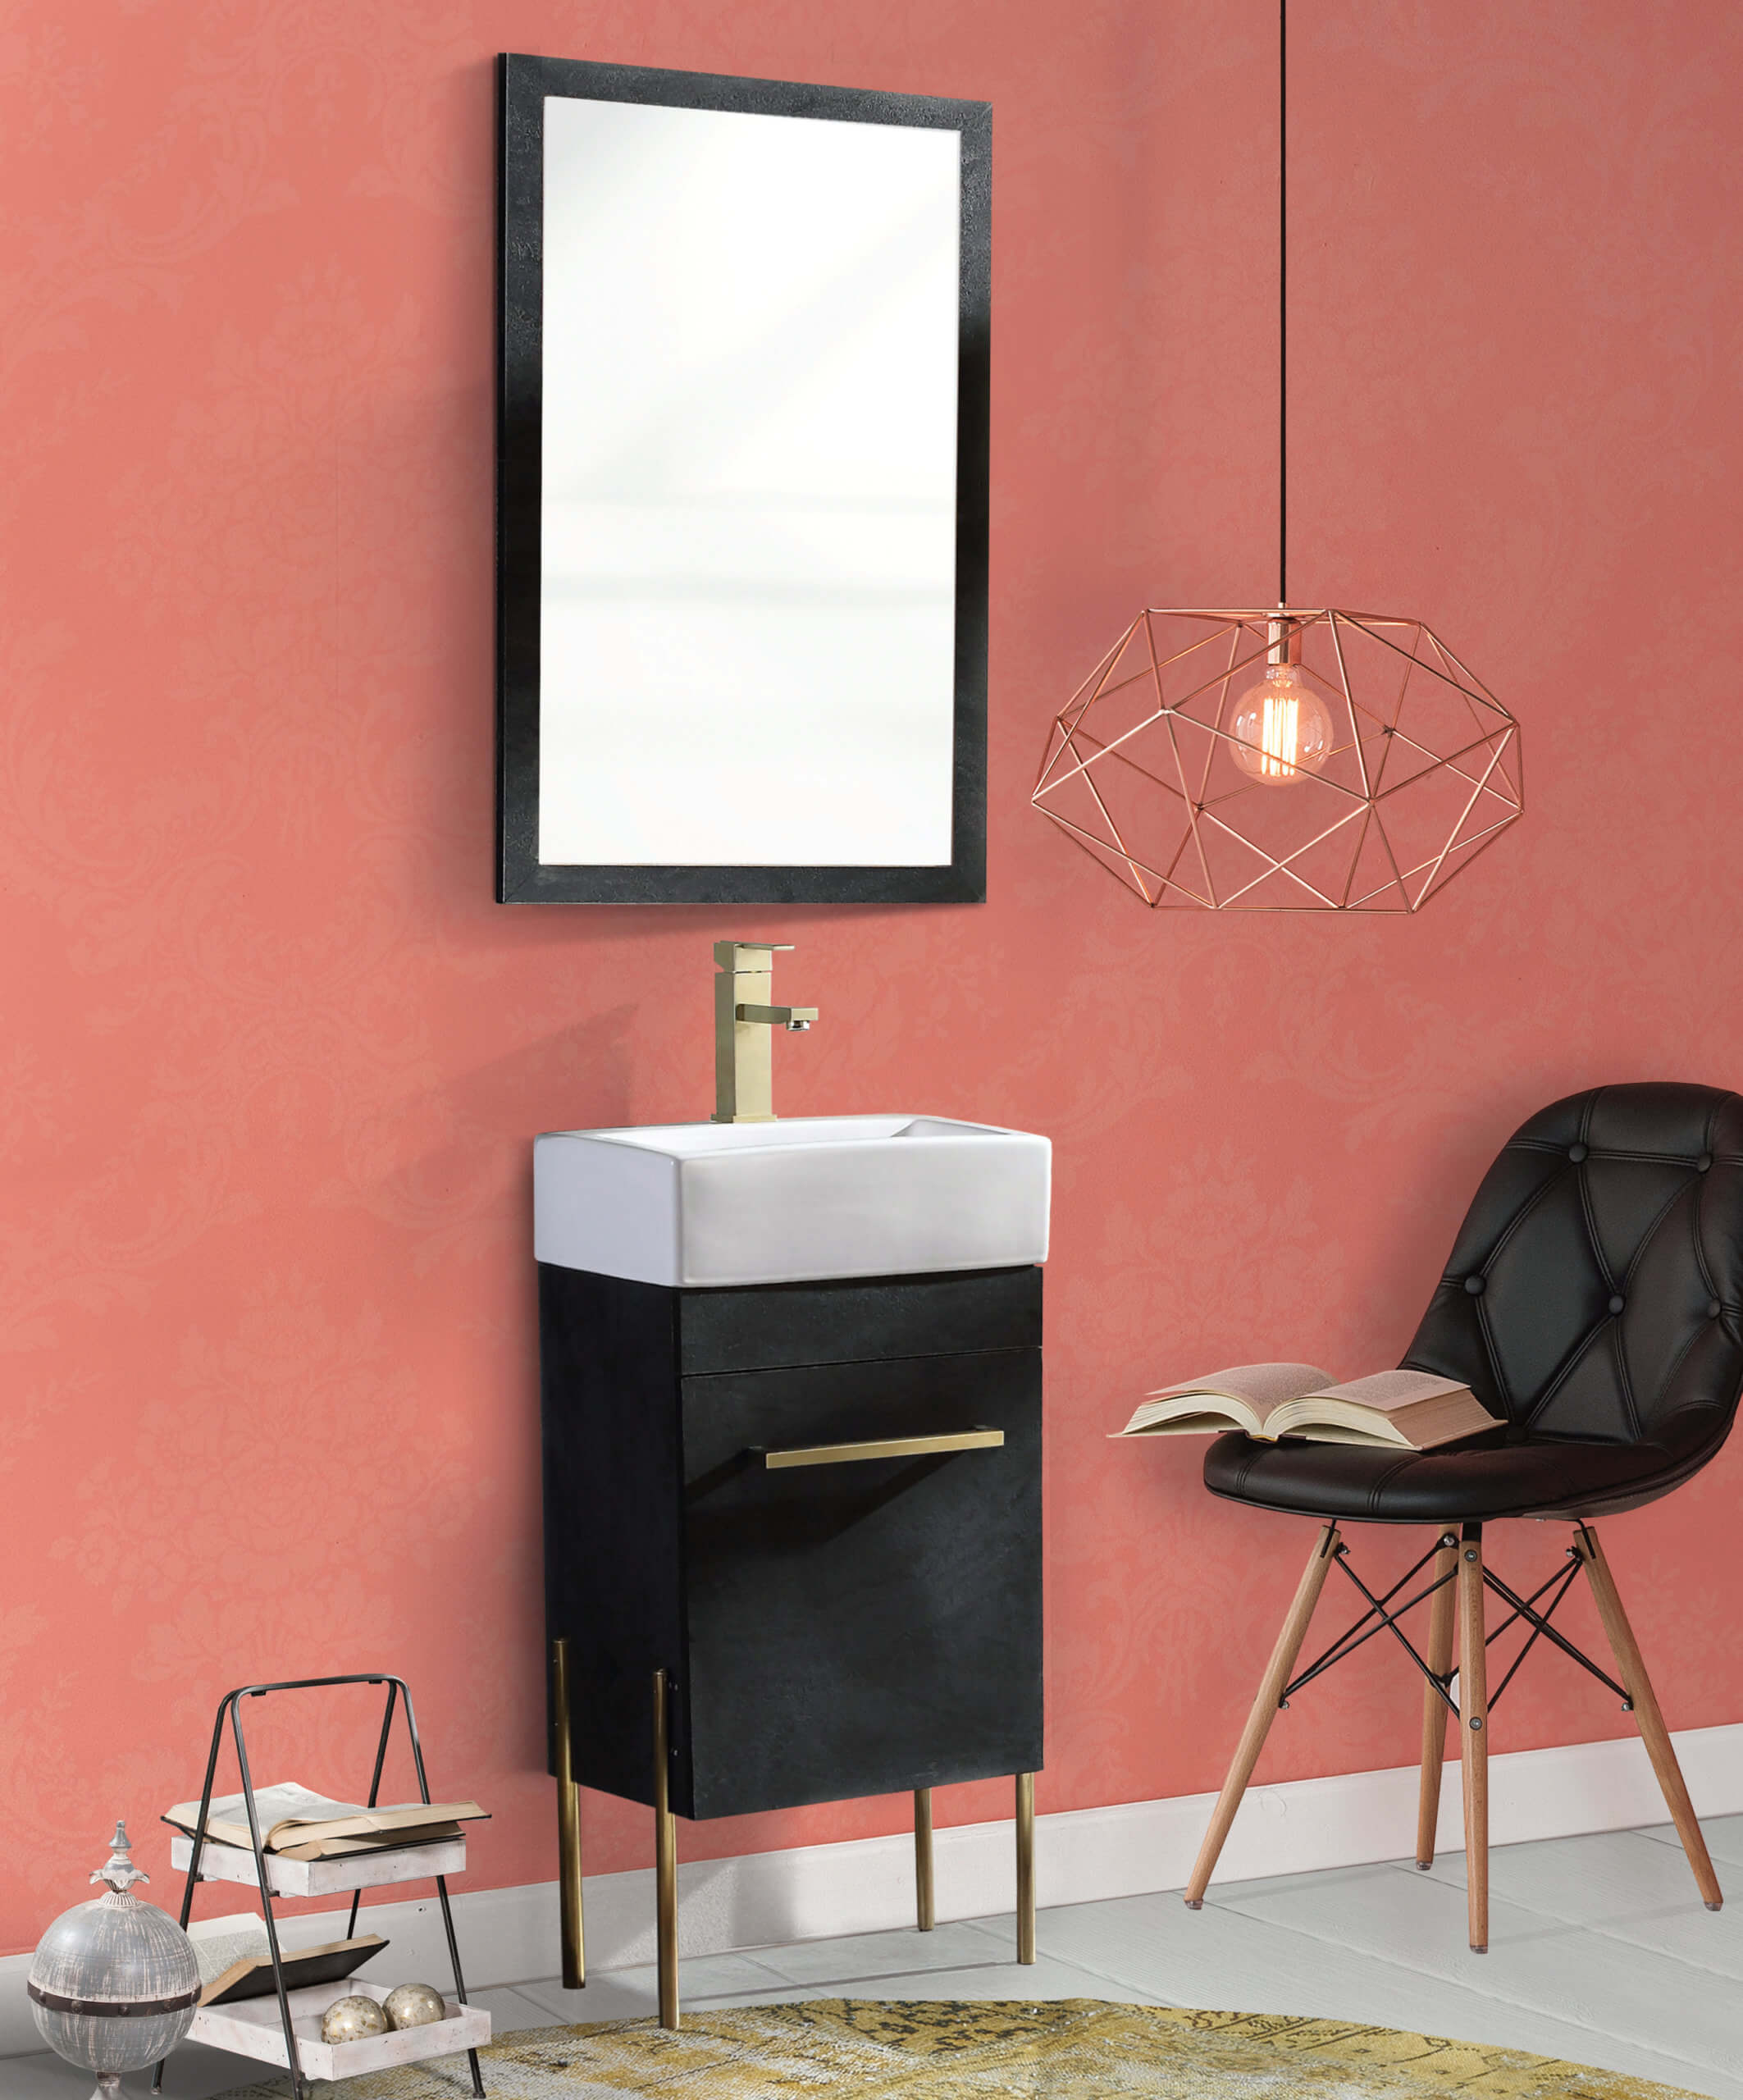 Fine Fixtures Modern Black Marble 18 Bathroom Vanity Set Satin Brass Hardware Vitreous China Sink Top Walmart Com Walmart Com